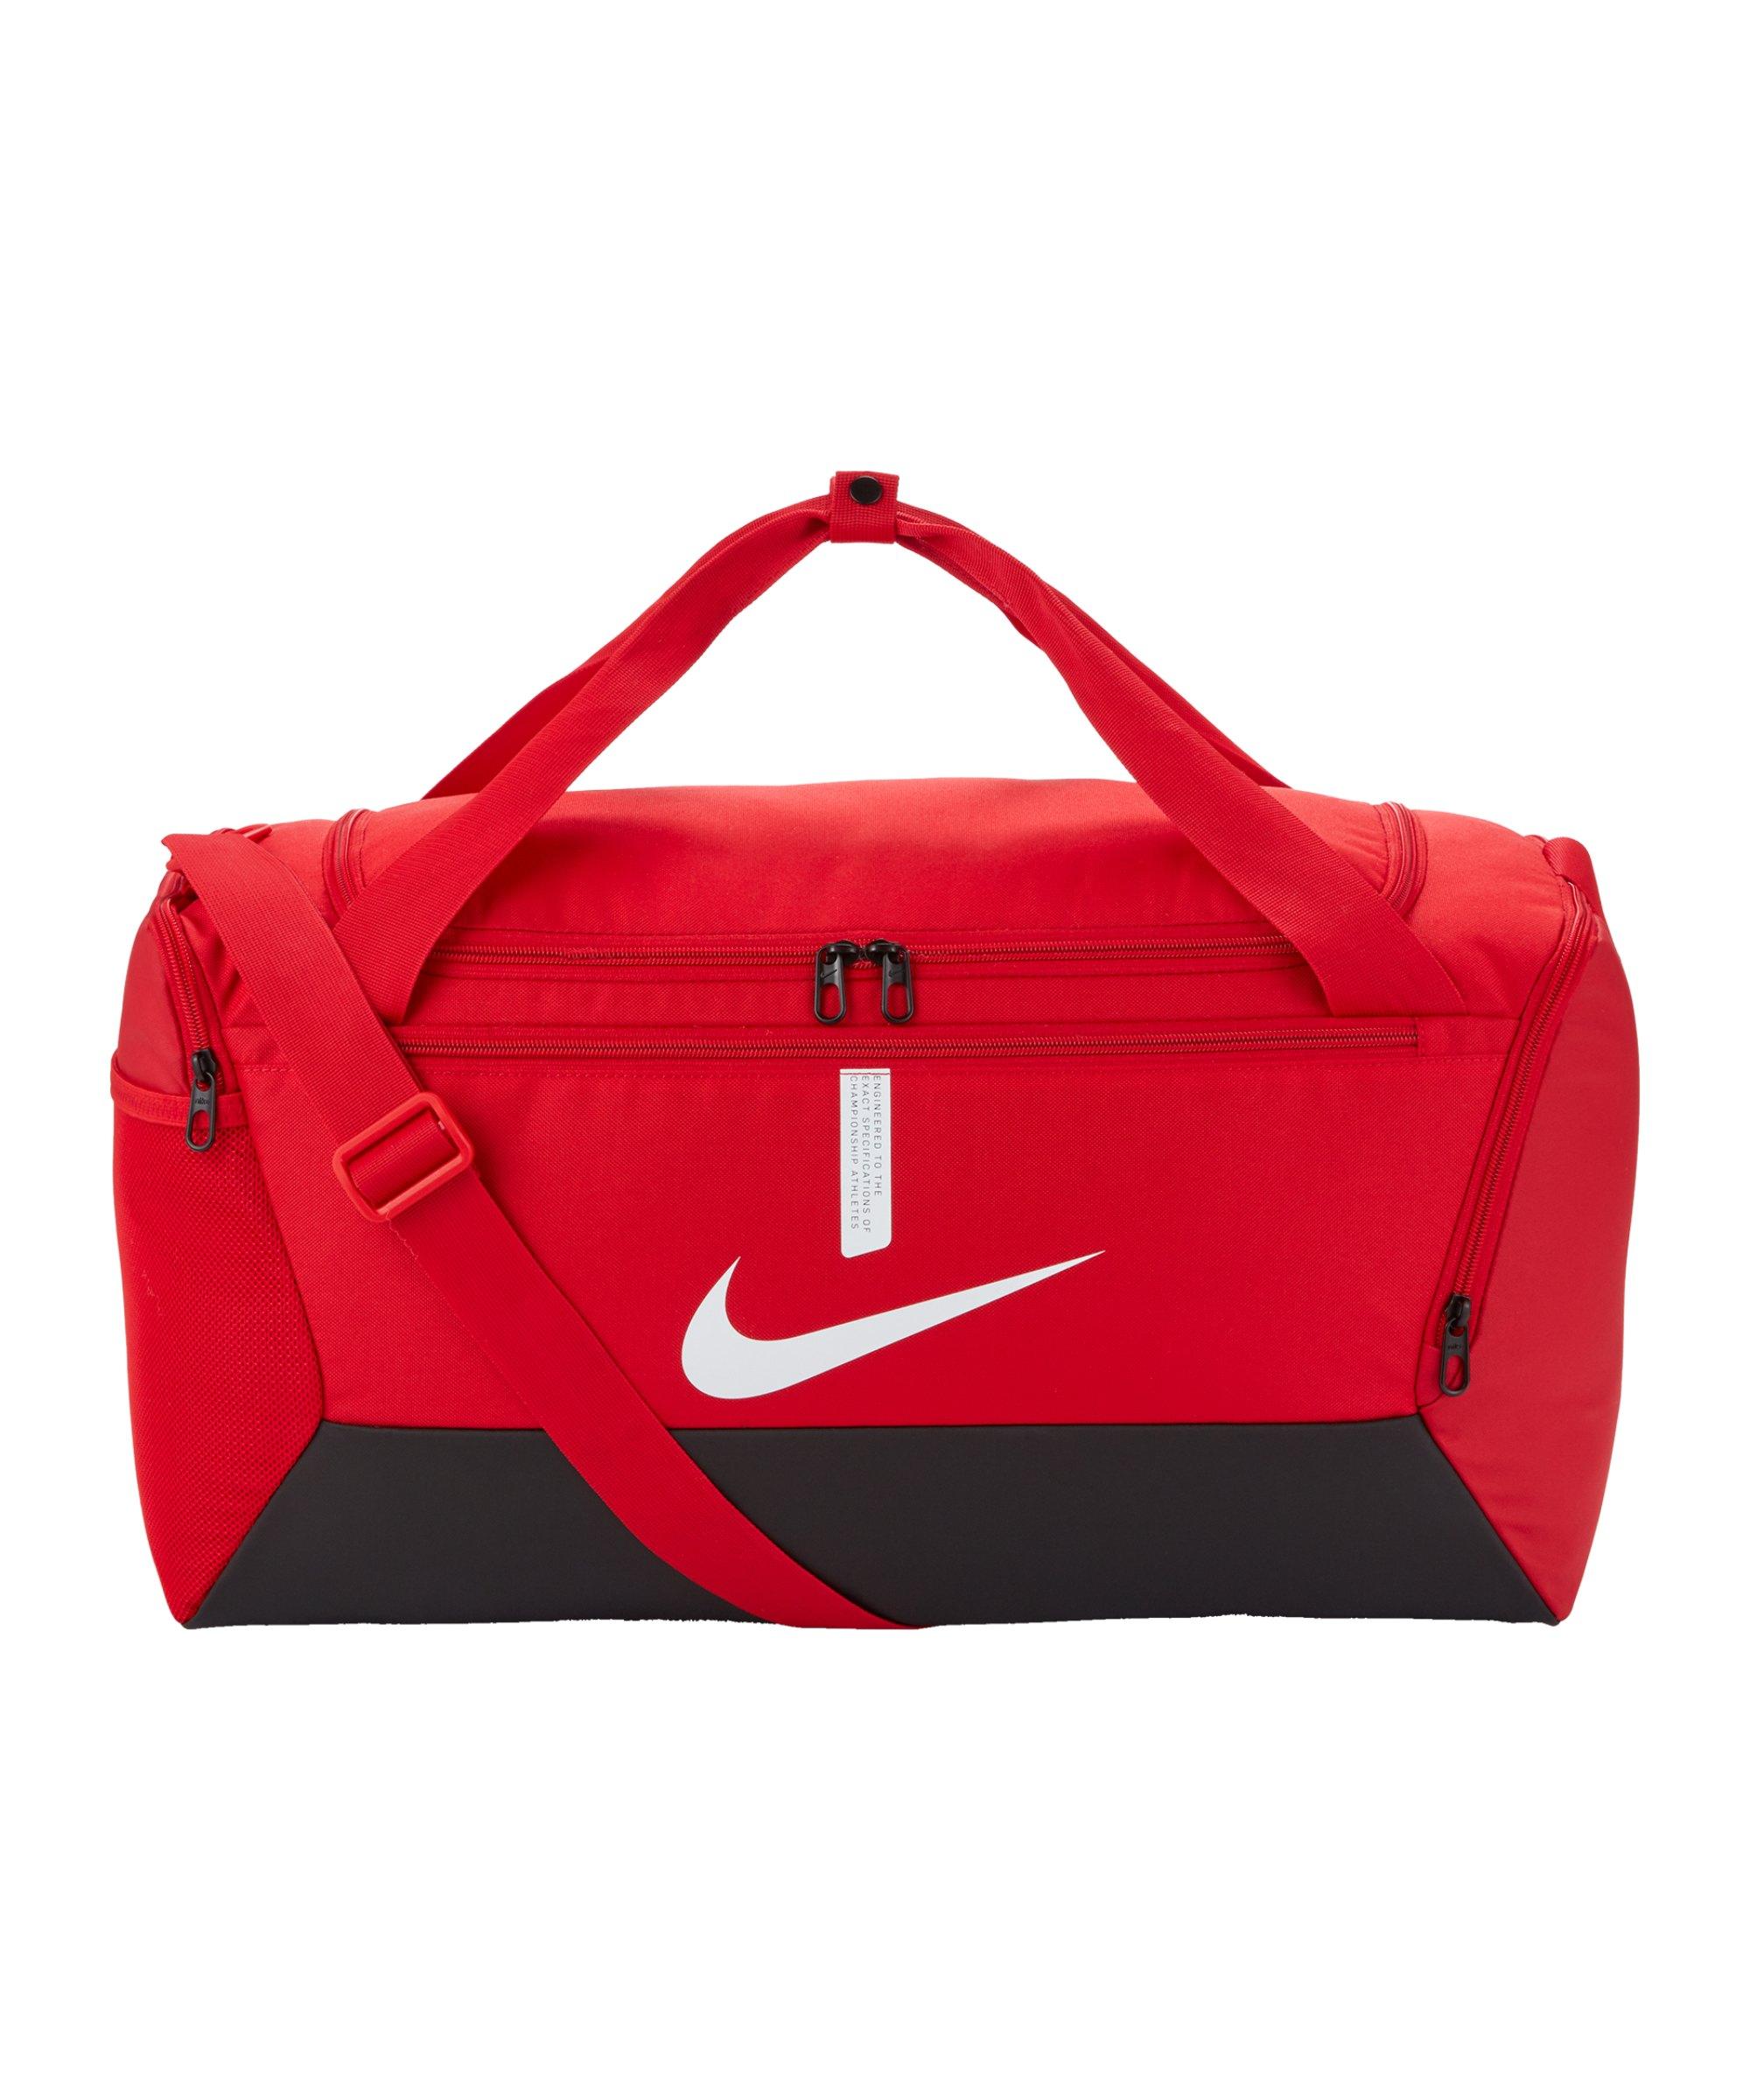 Nike Academy Team Duffel Tasche Small Rot F657 - rot